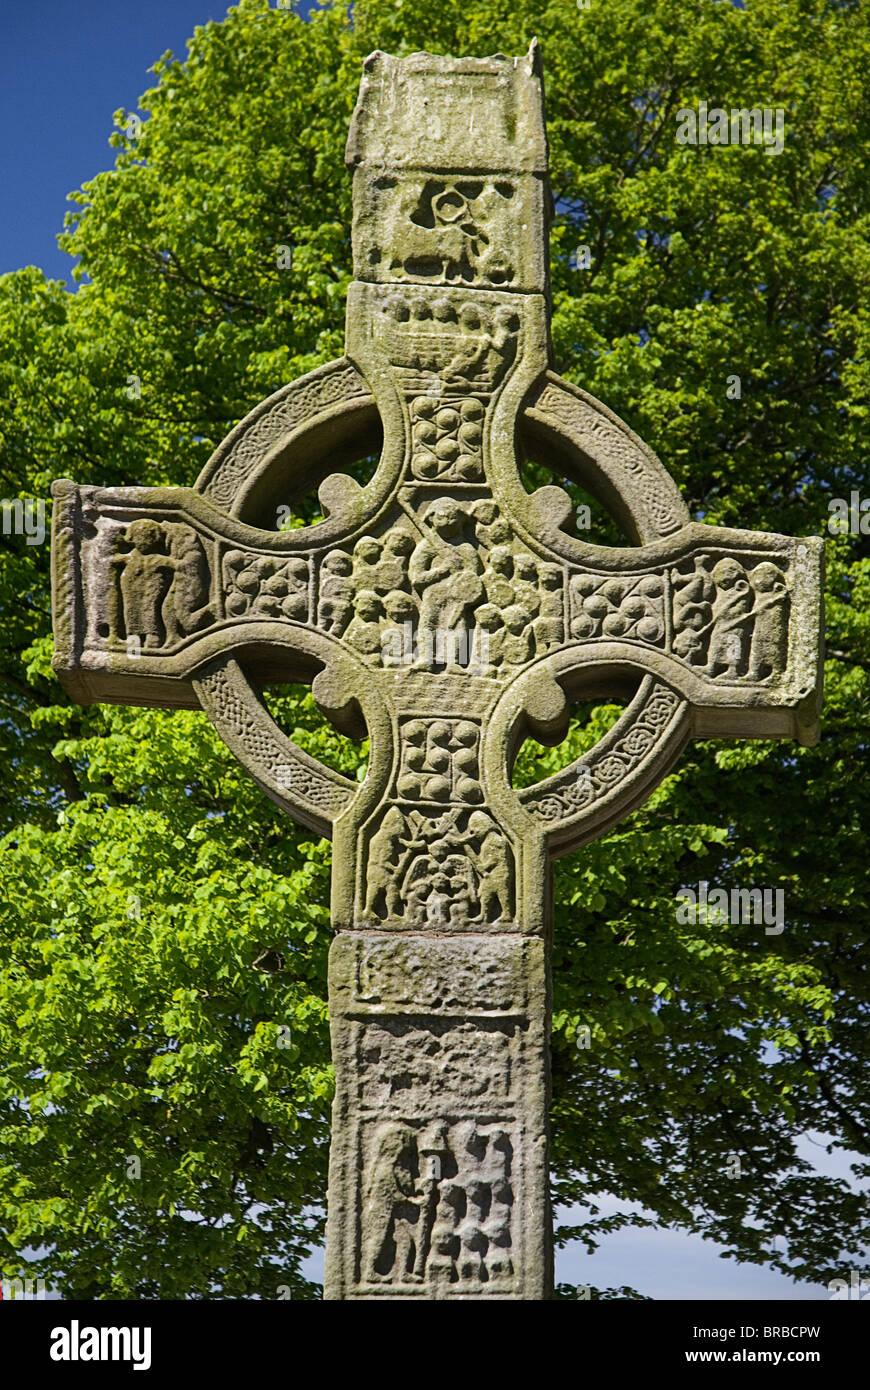 IRELAND County Louth Monasterboice Monastic site - Stock Image